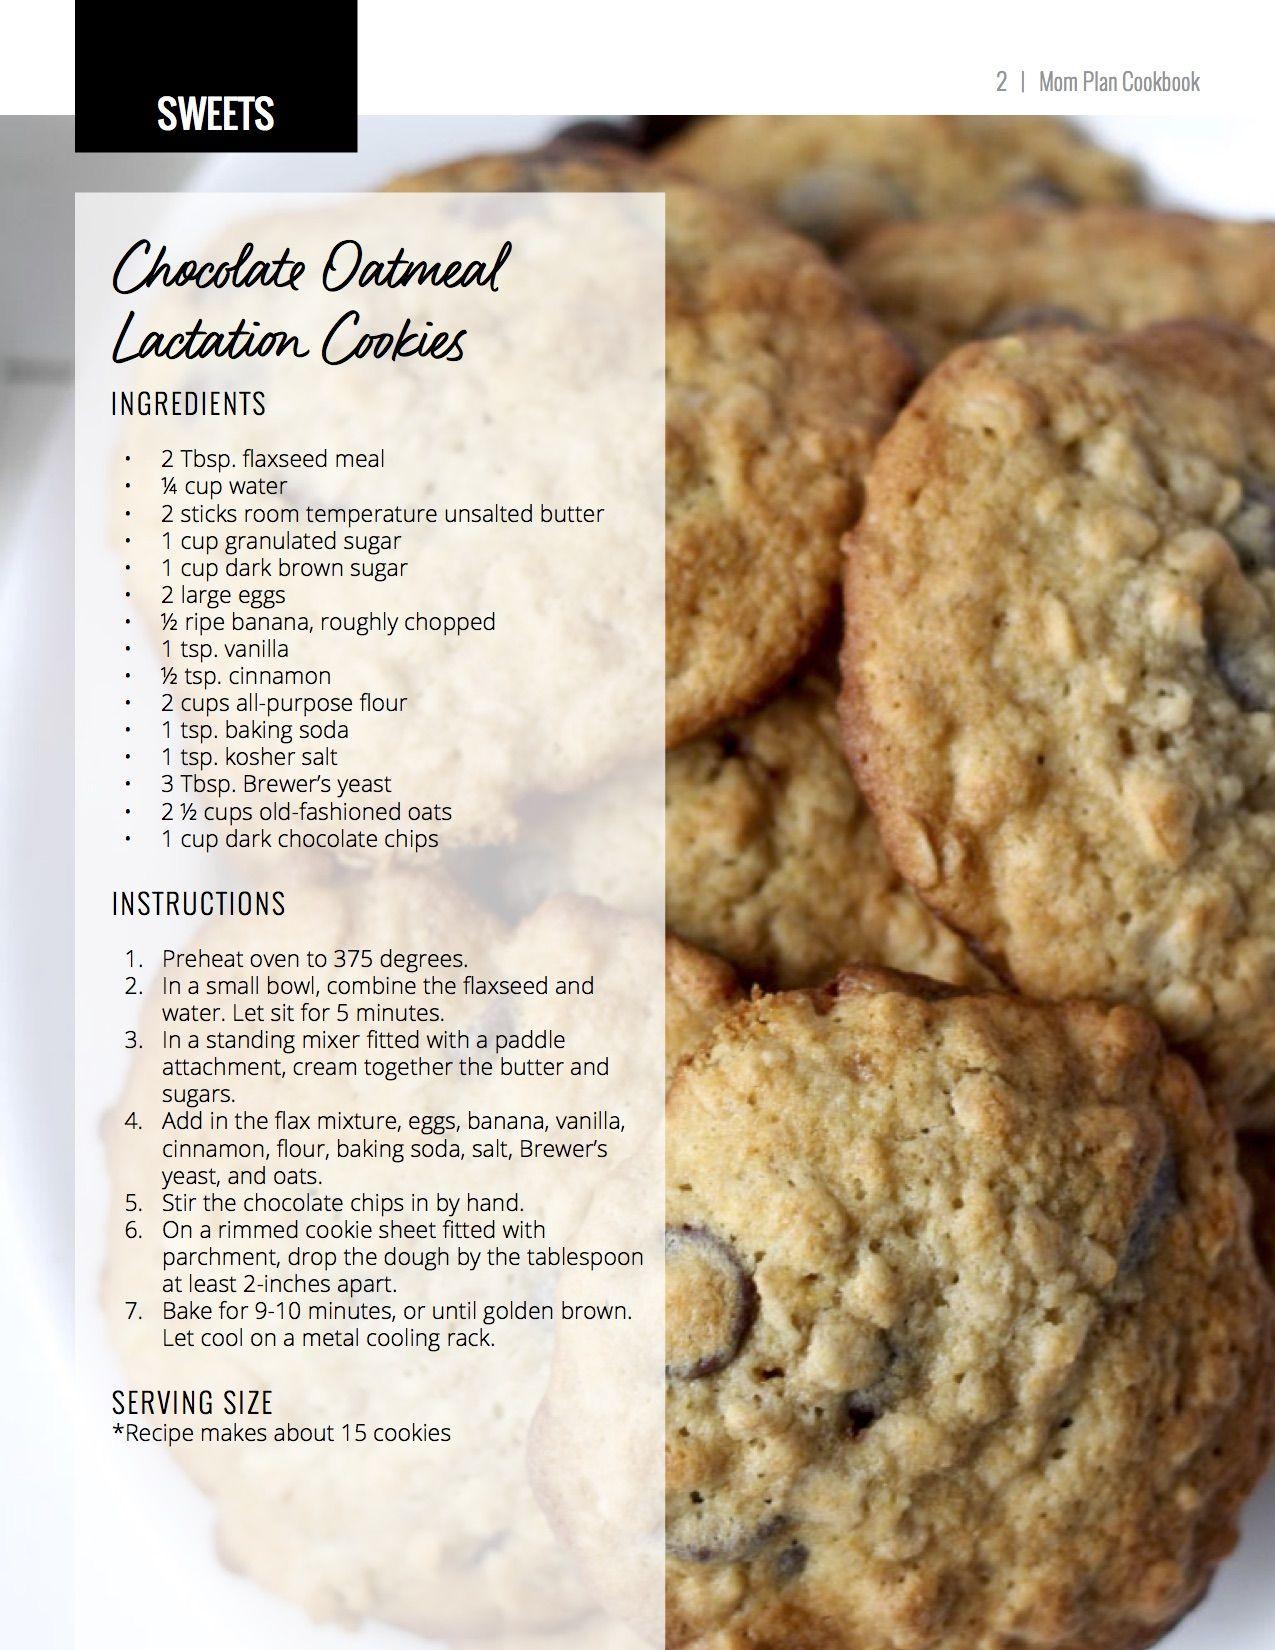 Chocolate Chip Lactation Cookie Recipe Lauren Gleisberg Recipe Lactation Cookies Baby Food Recipes Lactation Cookies Recipe